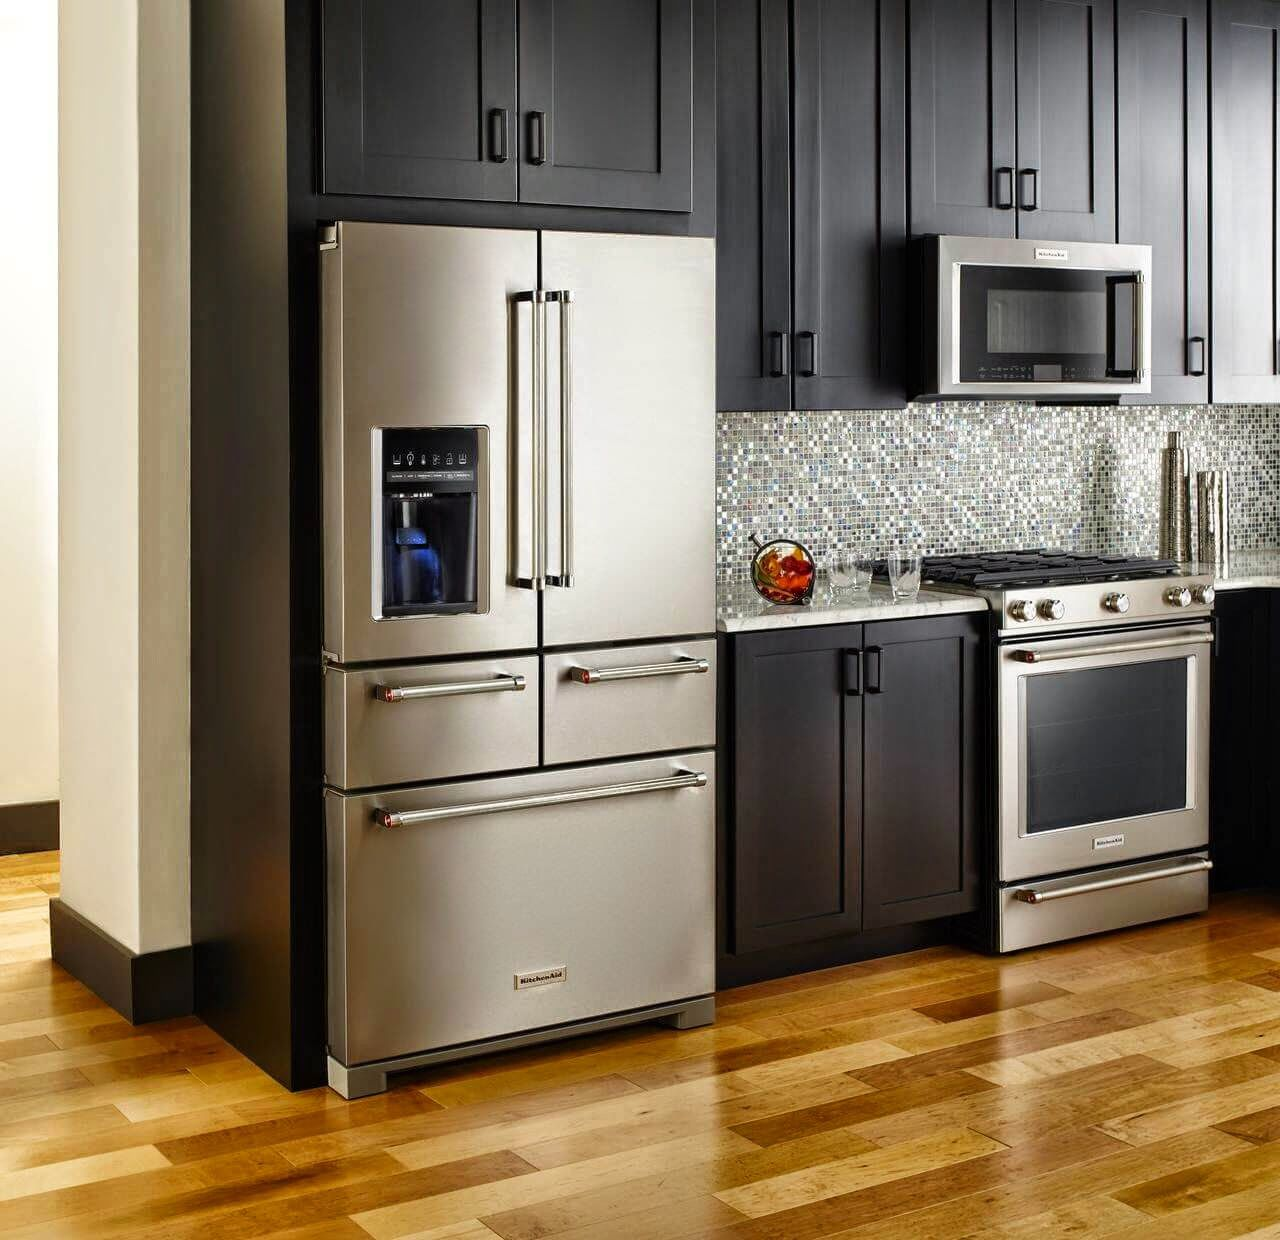 Kitchen aid appliances..   Kitchen aid appliances, Kitchen ...